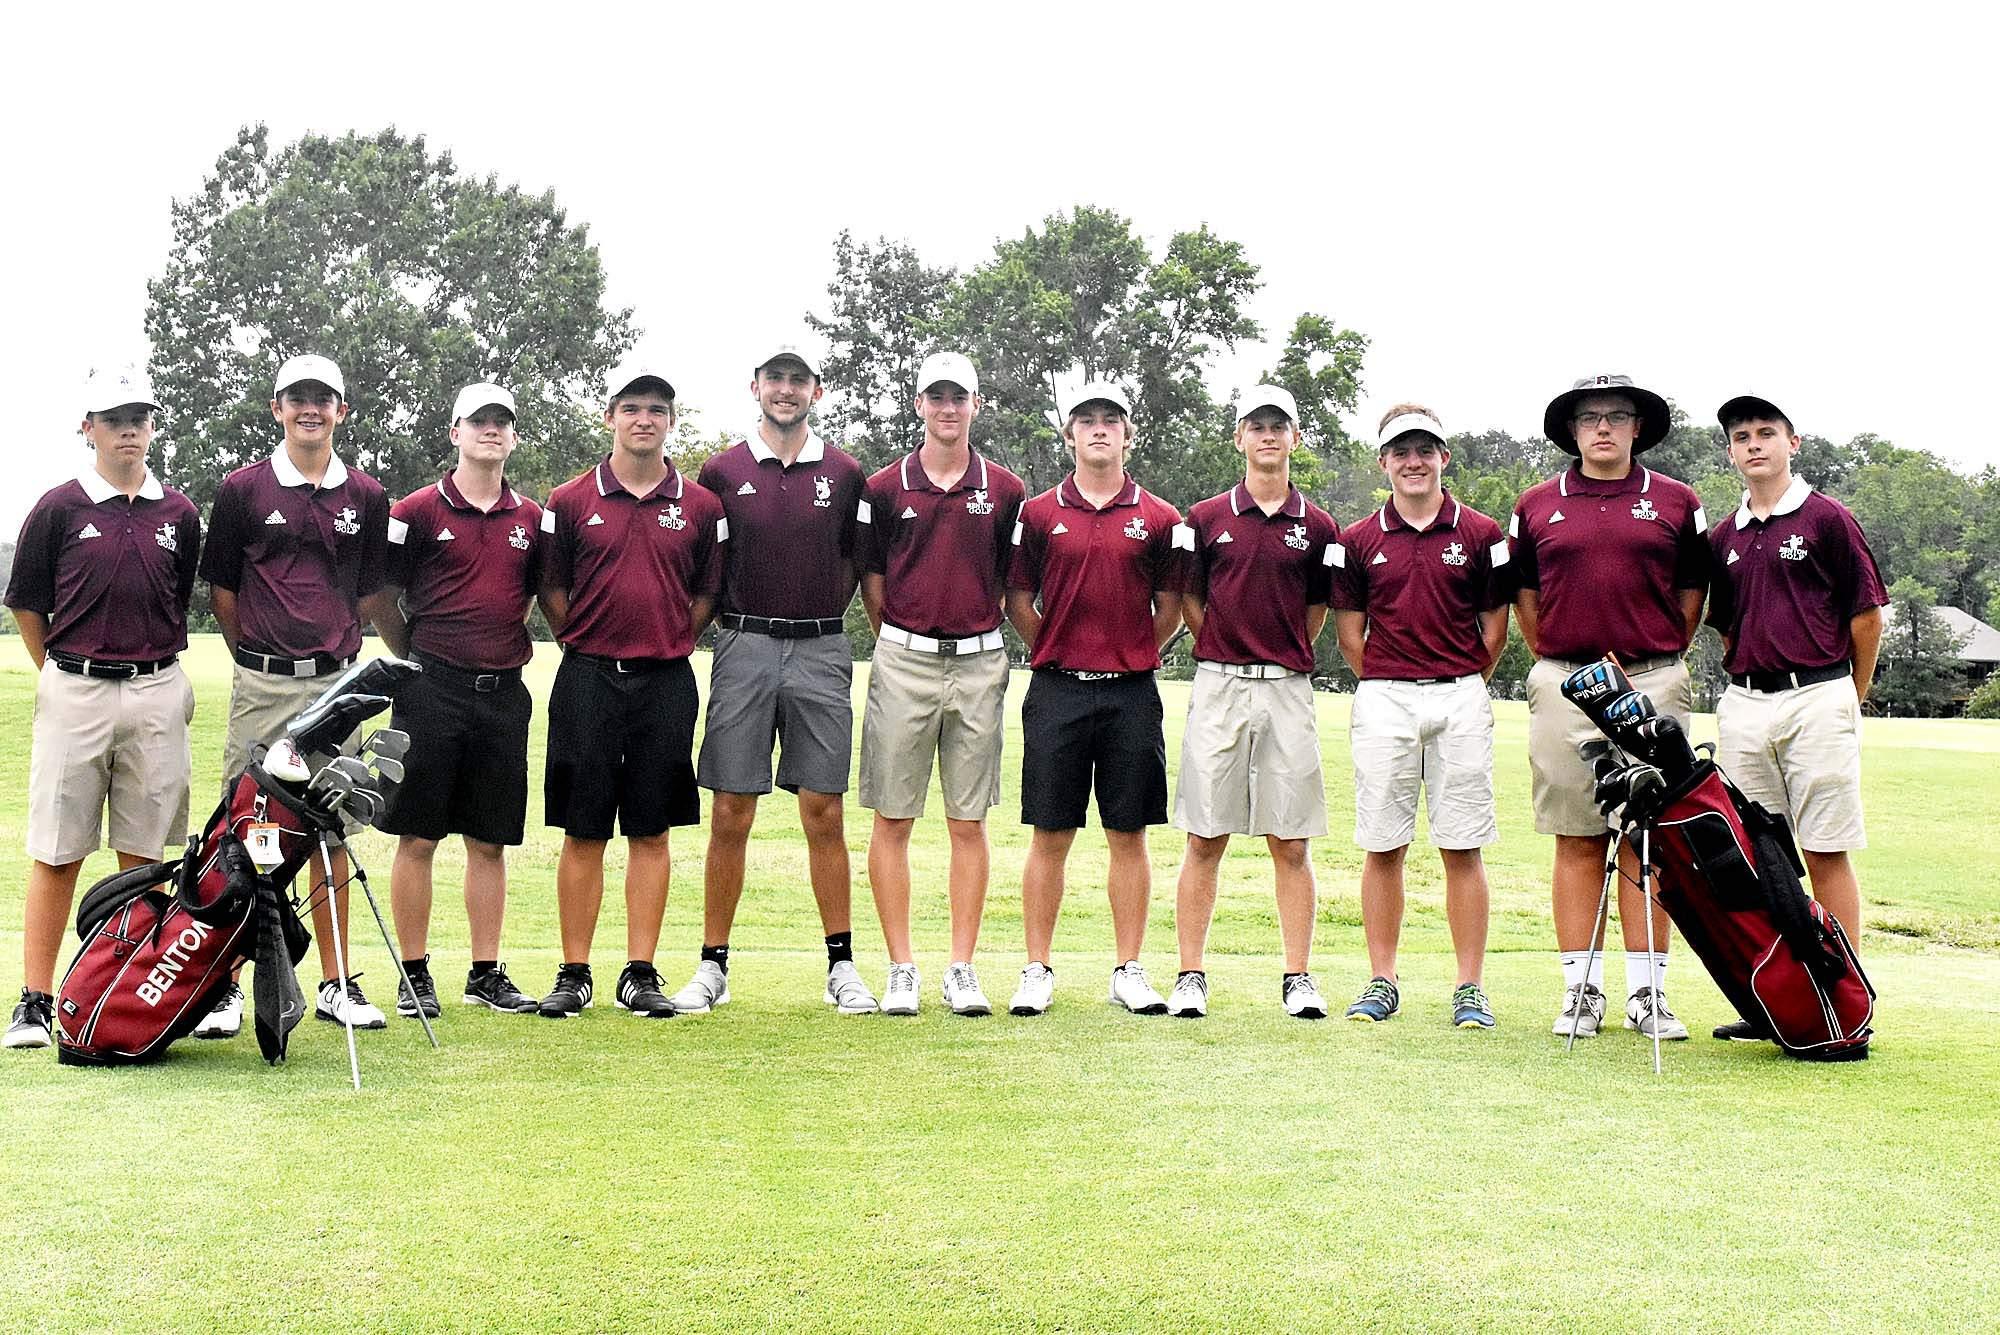 RICK HAYES PHOTOBenton High School golf team members from left are: Andrew Bell, Peyton Sieveking, Cole Brugger, Eldon Owens, Robbie Moore, Brendan Luster, Brad Hammond, Jared Shaw, Brett Merkel, Collin Miller and Keaton House.